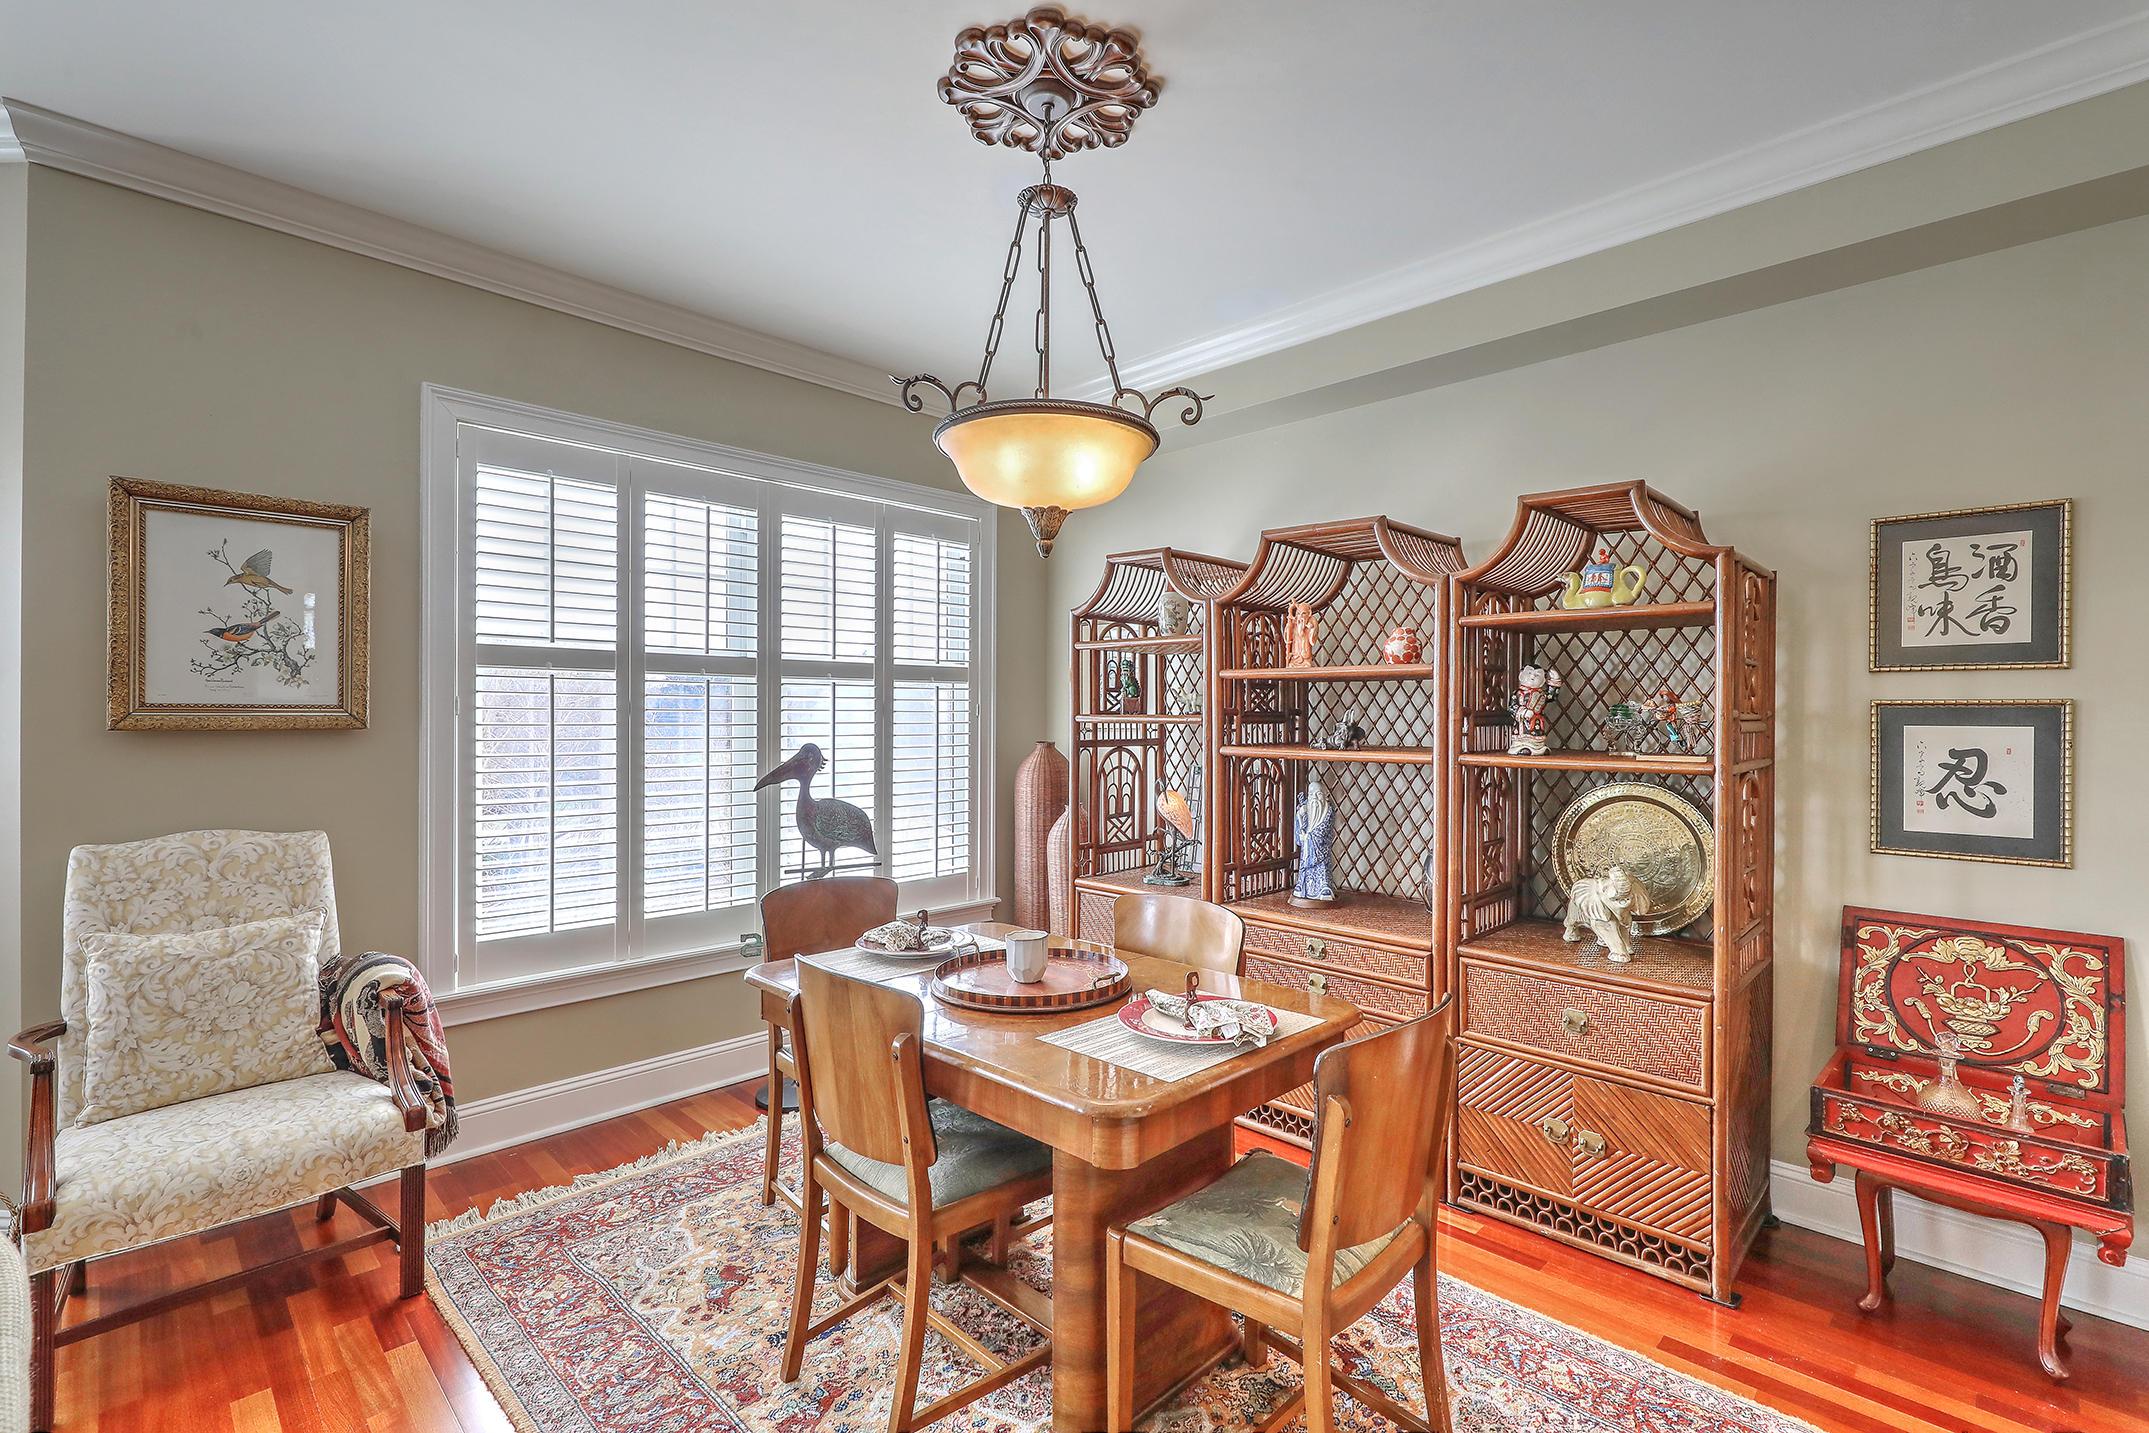 Albemarle Condos For Sale - 498 Albemarle, Charleston, SC - 18